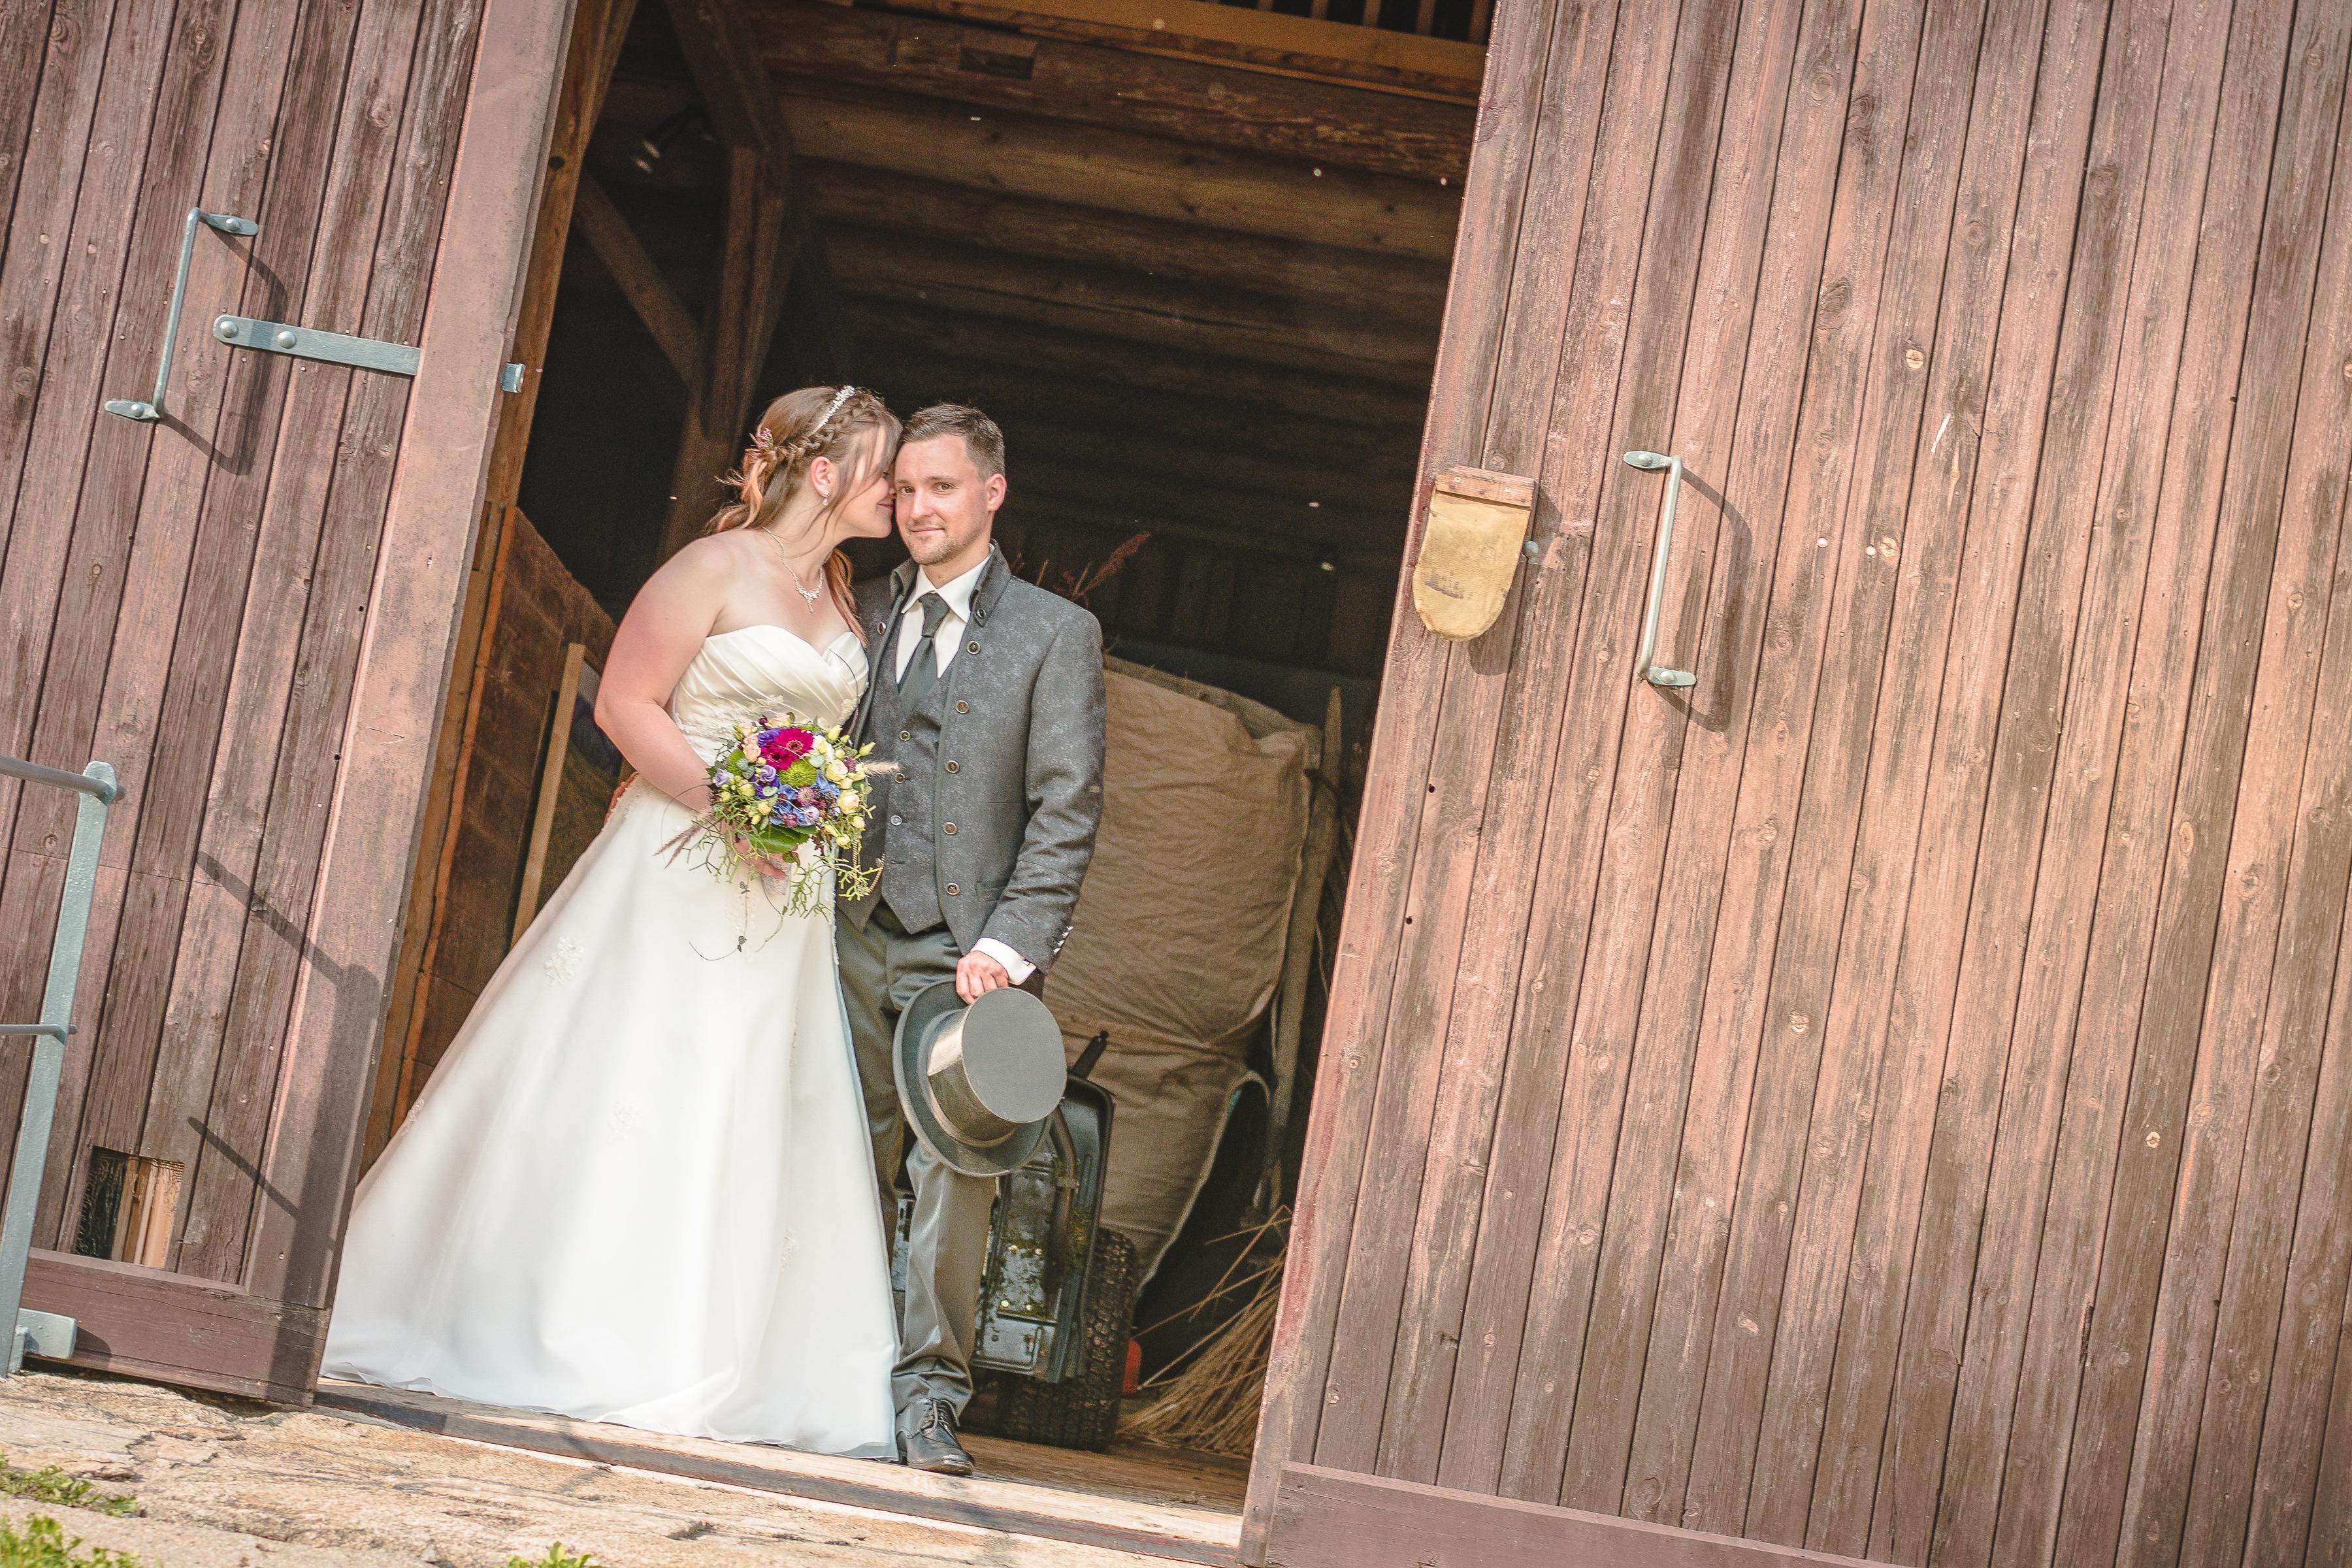 https://sleeklens.com/wp-content/uploads/2018/09/wedding-lightroom-presets-signature-bride-groom-after-6.jpg